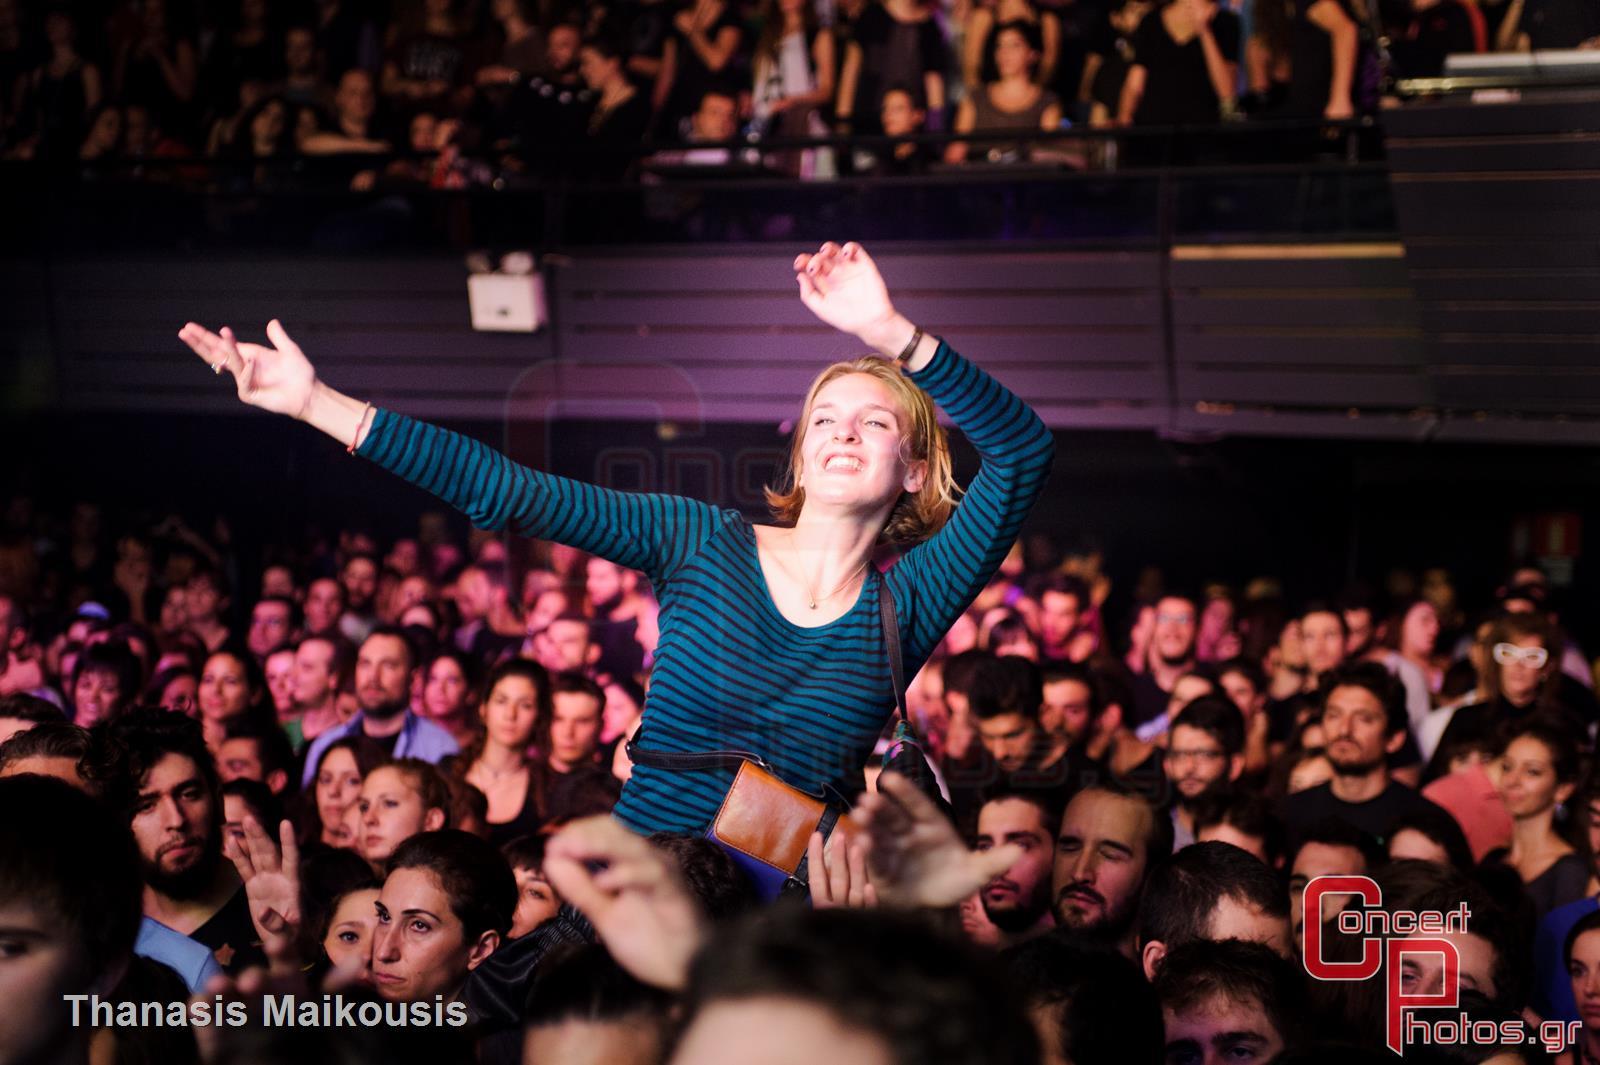 Gramatik-Gramatik Votanikos 2013 photographer: Thanasis Maikousis - ConcertPhotos-6060